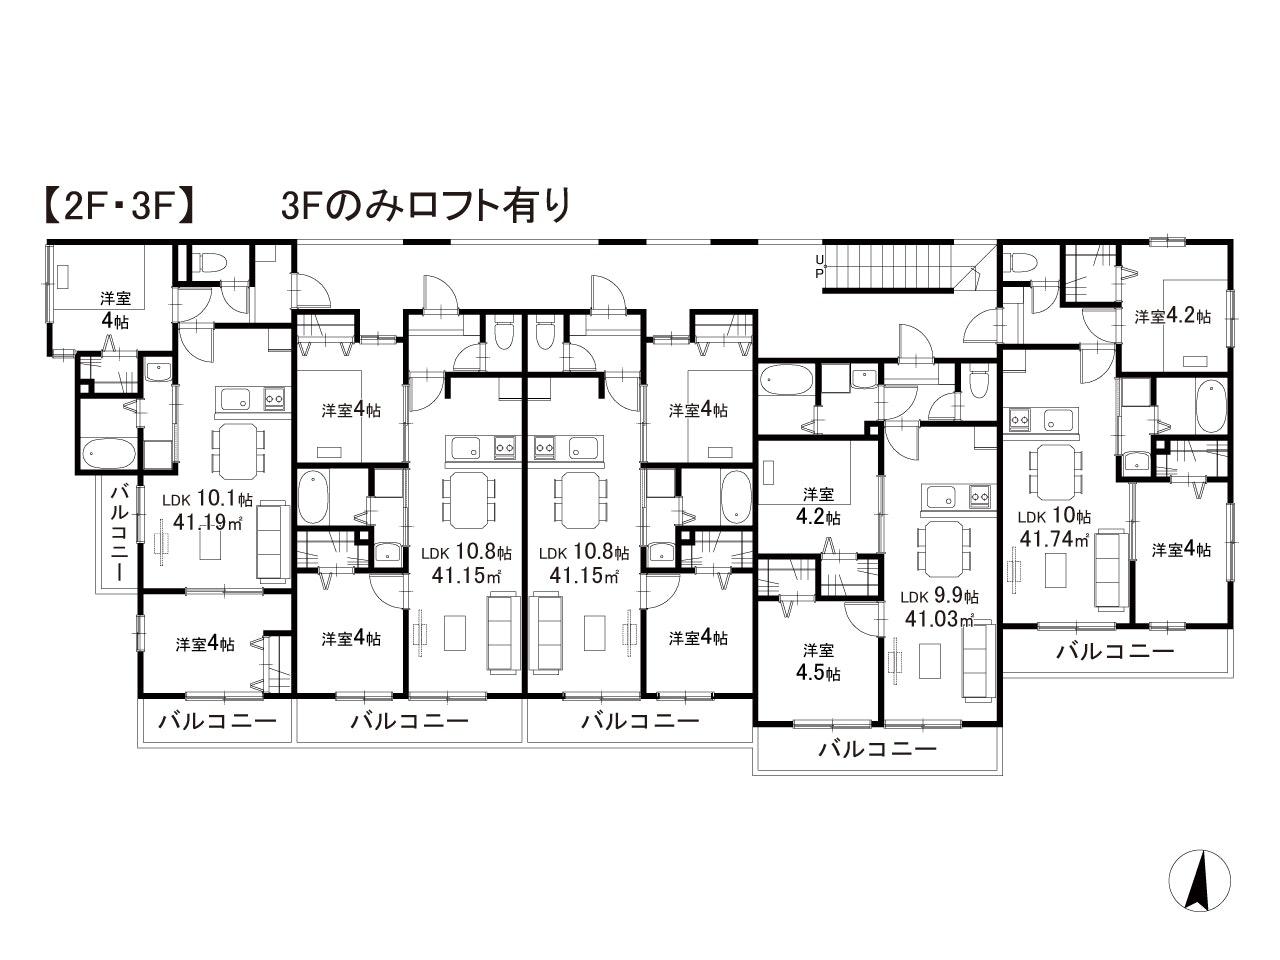 b1052_plan_002.jpg